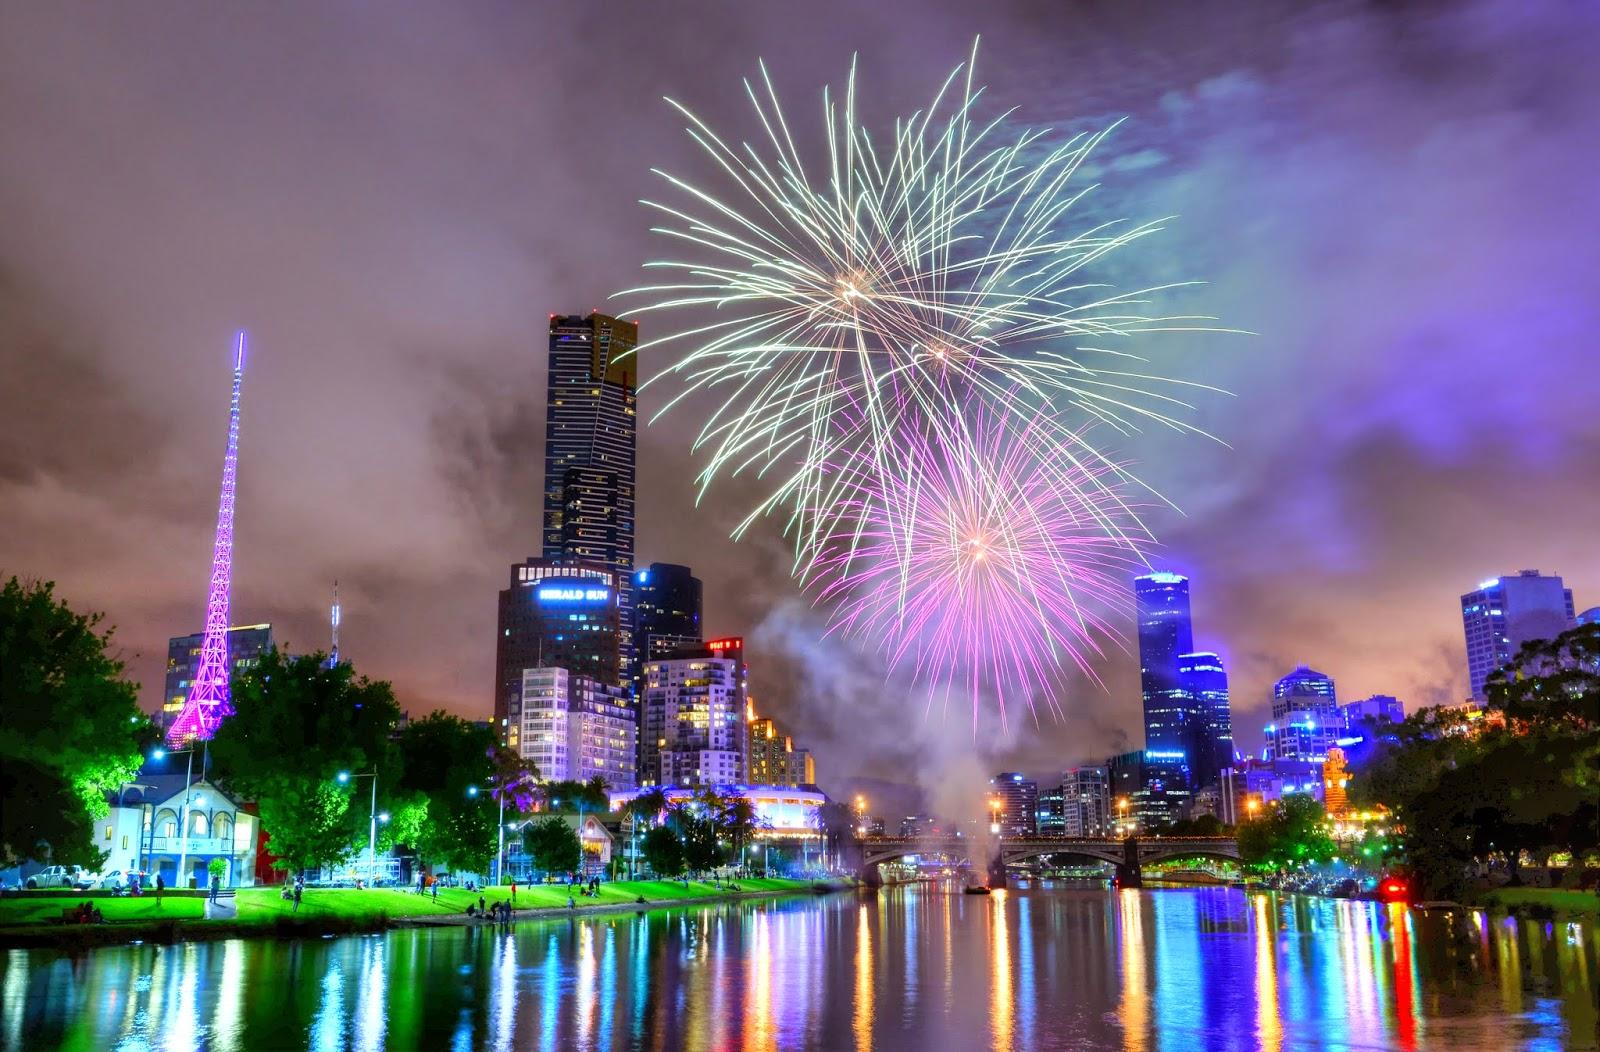 diwali night city image